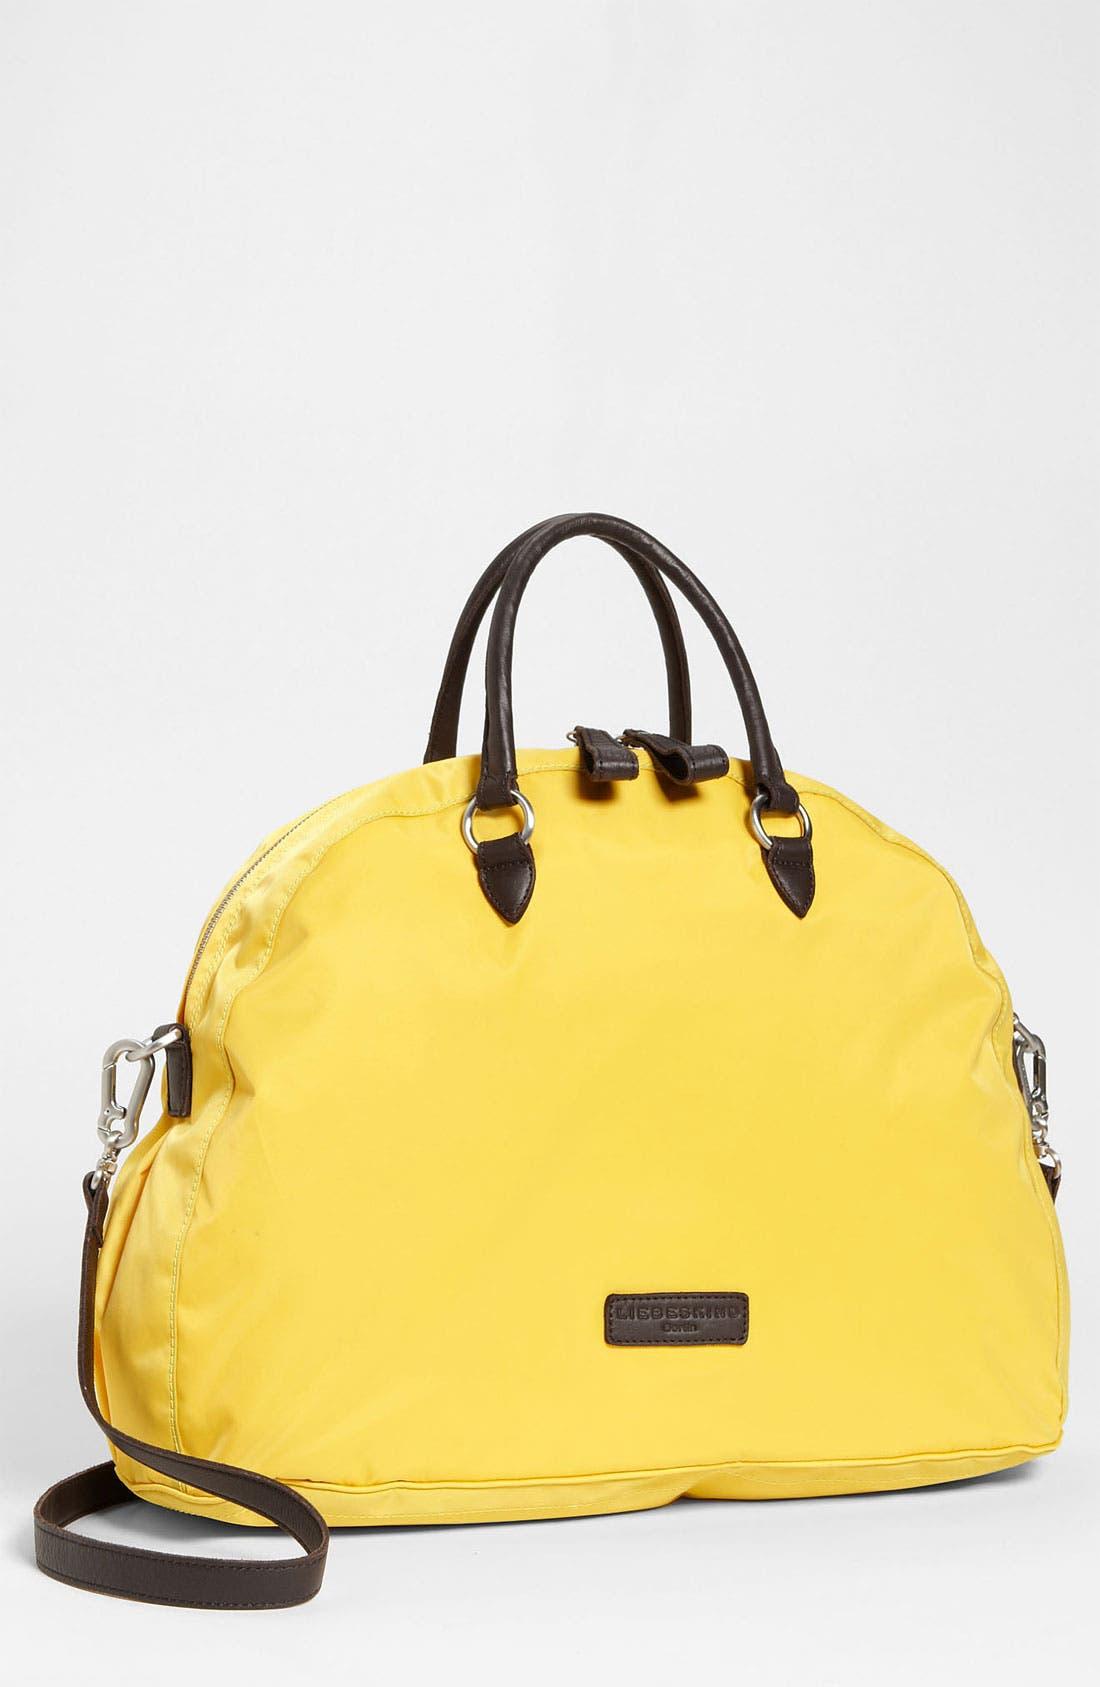 Alternate Image 1 Selected - Liebeskind 'Large' Crossbody Bag